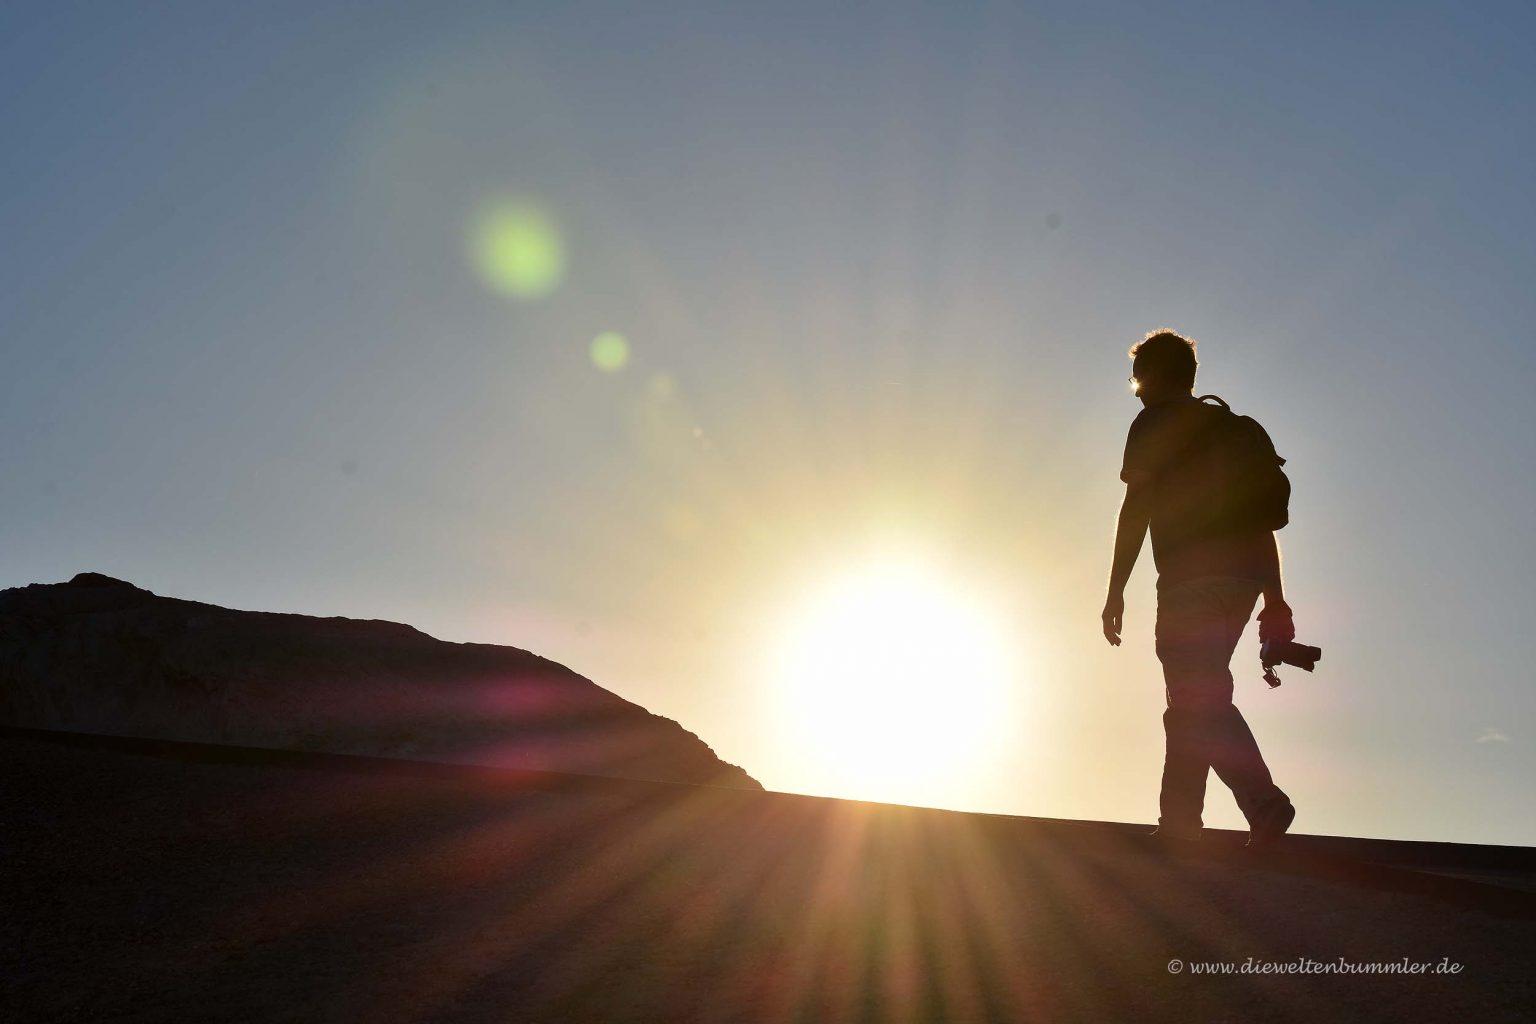 Wanderung im Sonnenuntergang